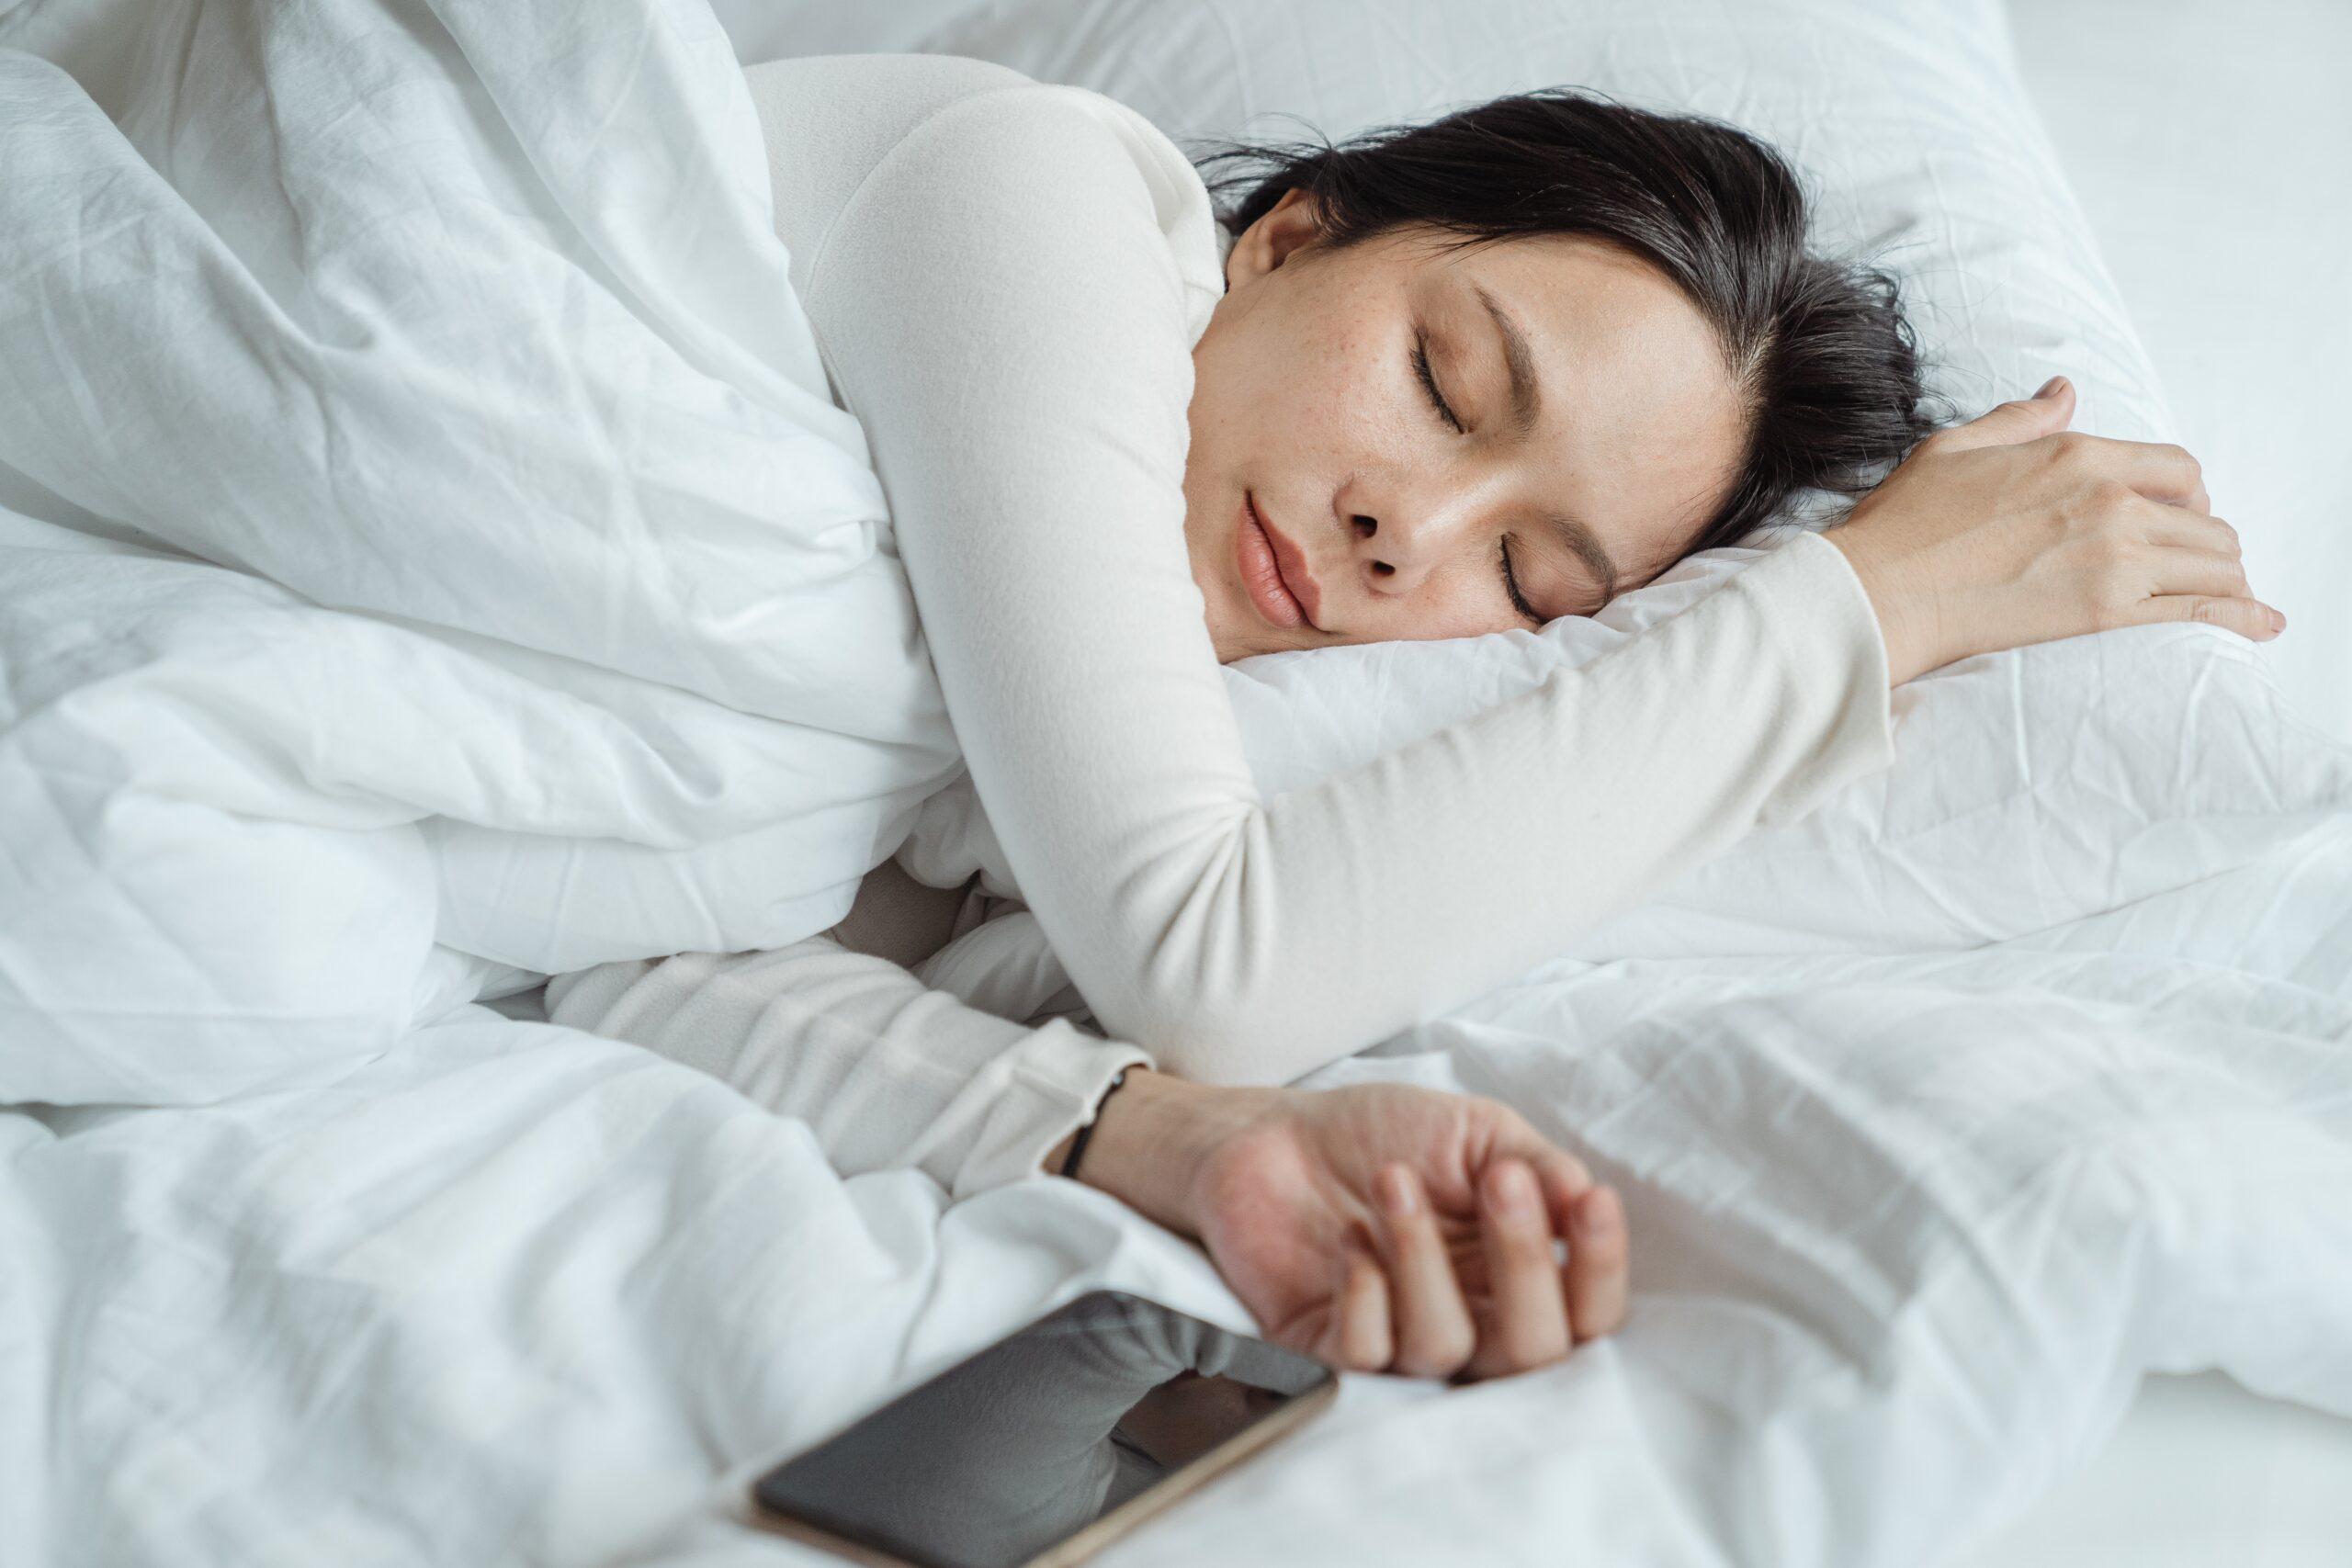 SLEEP SUPPORT SOFT-GELS